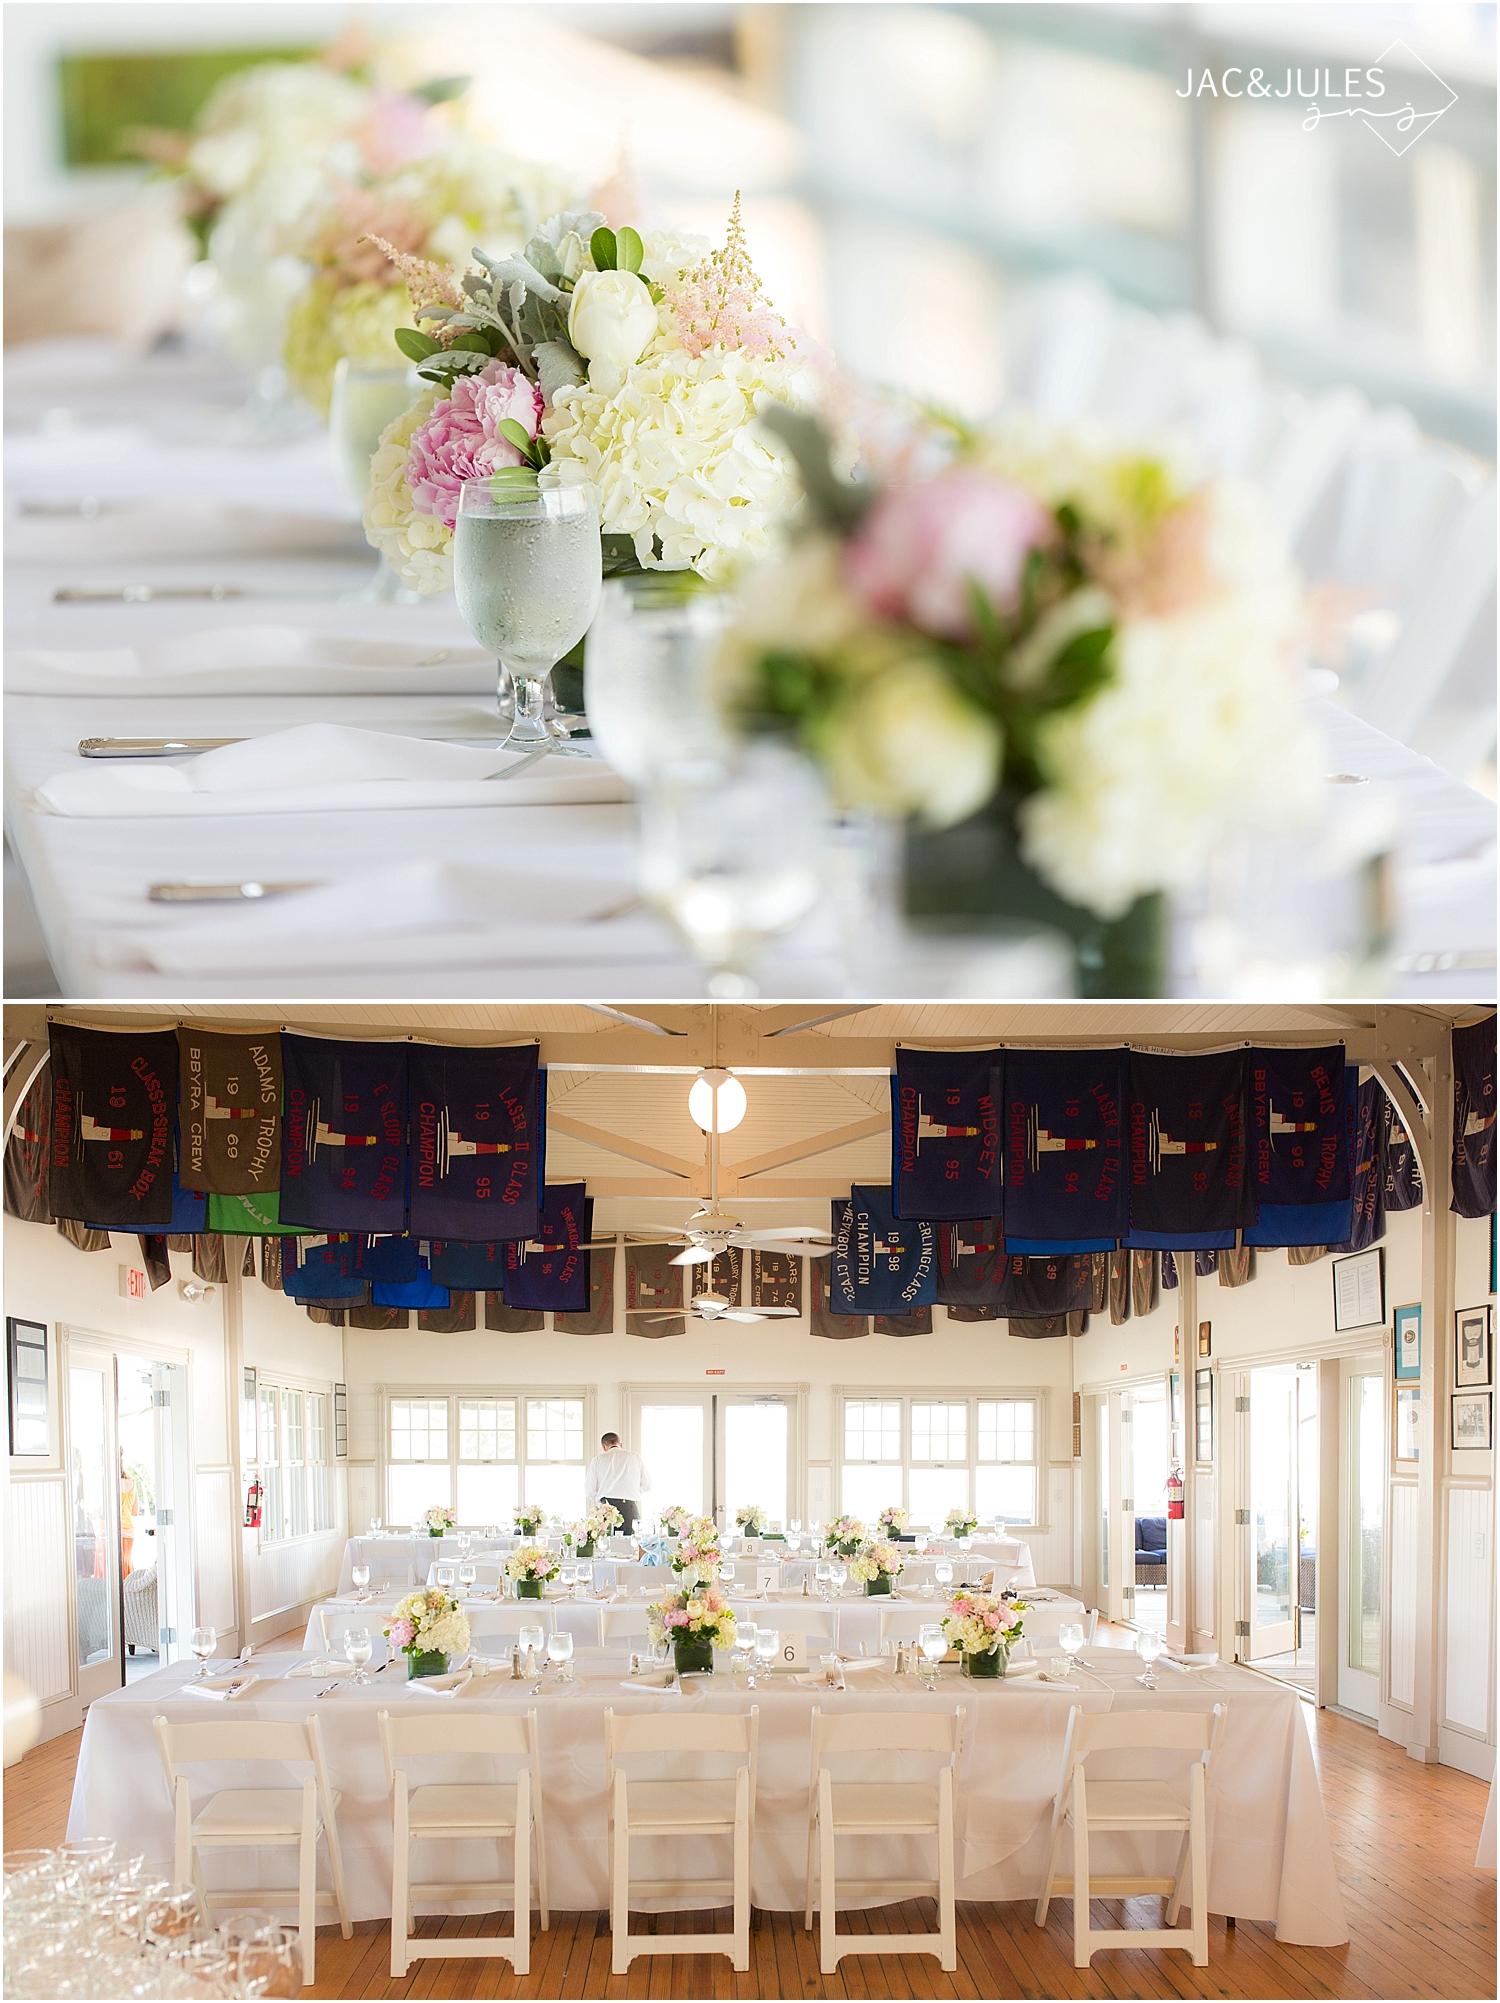 jacnjules photograph wedding reception details at mantoloking yacht club